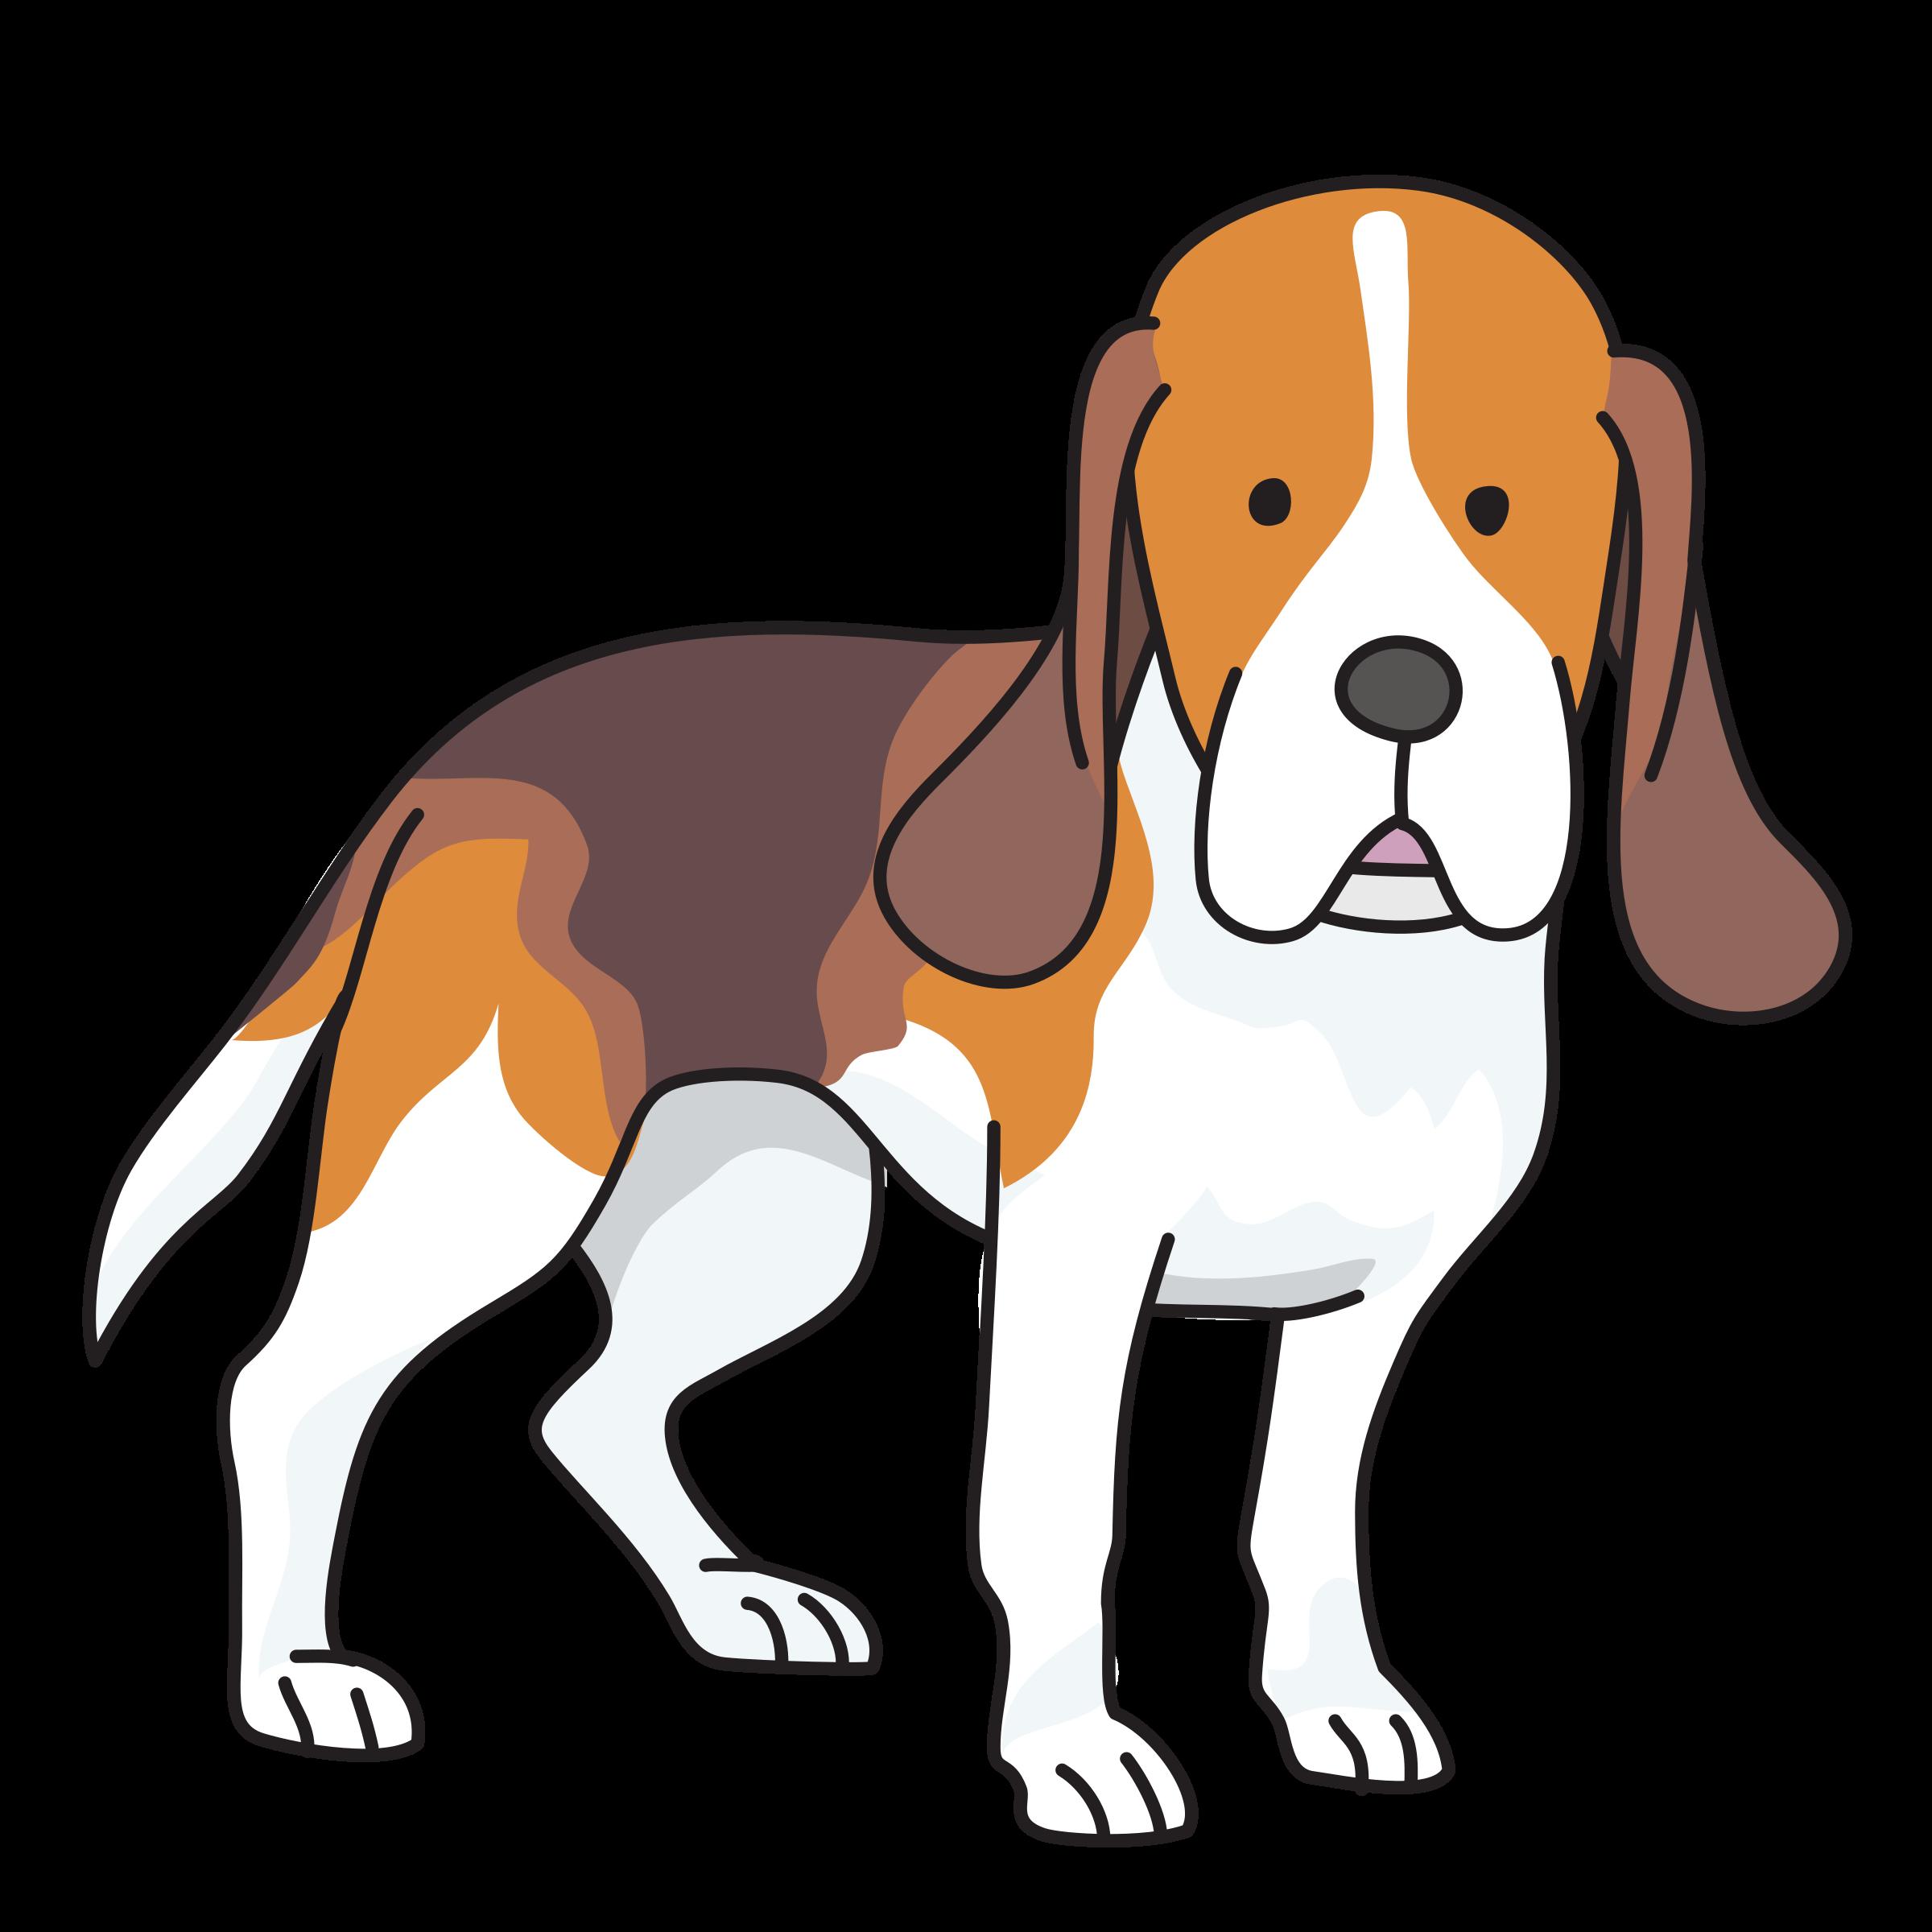 Beagle clipart. Dog big image png